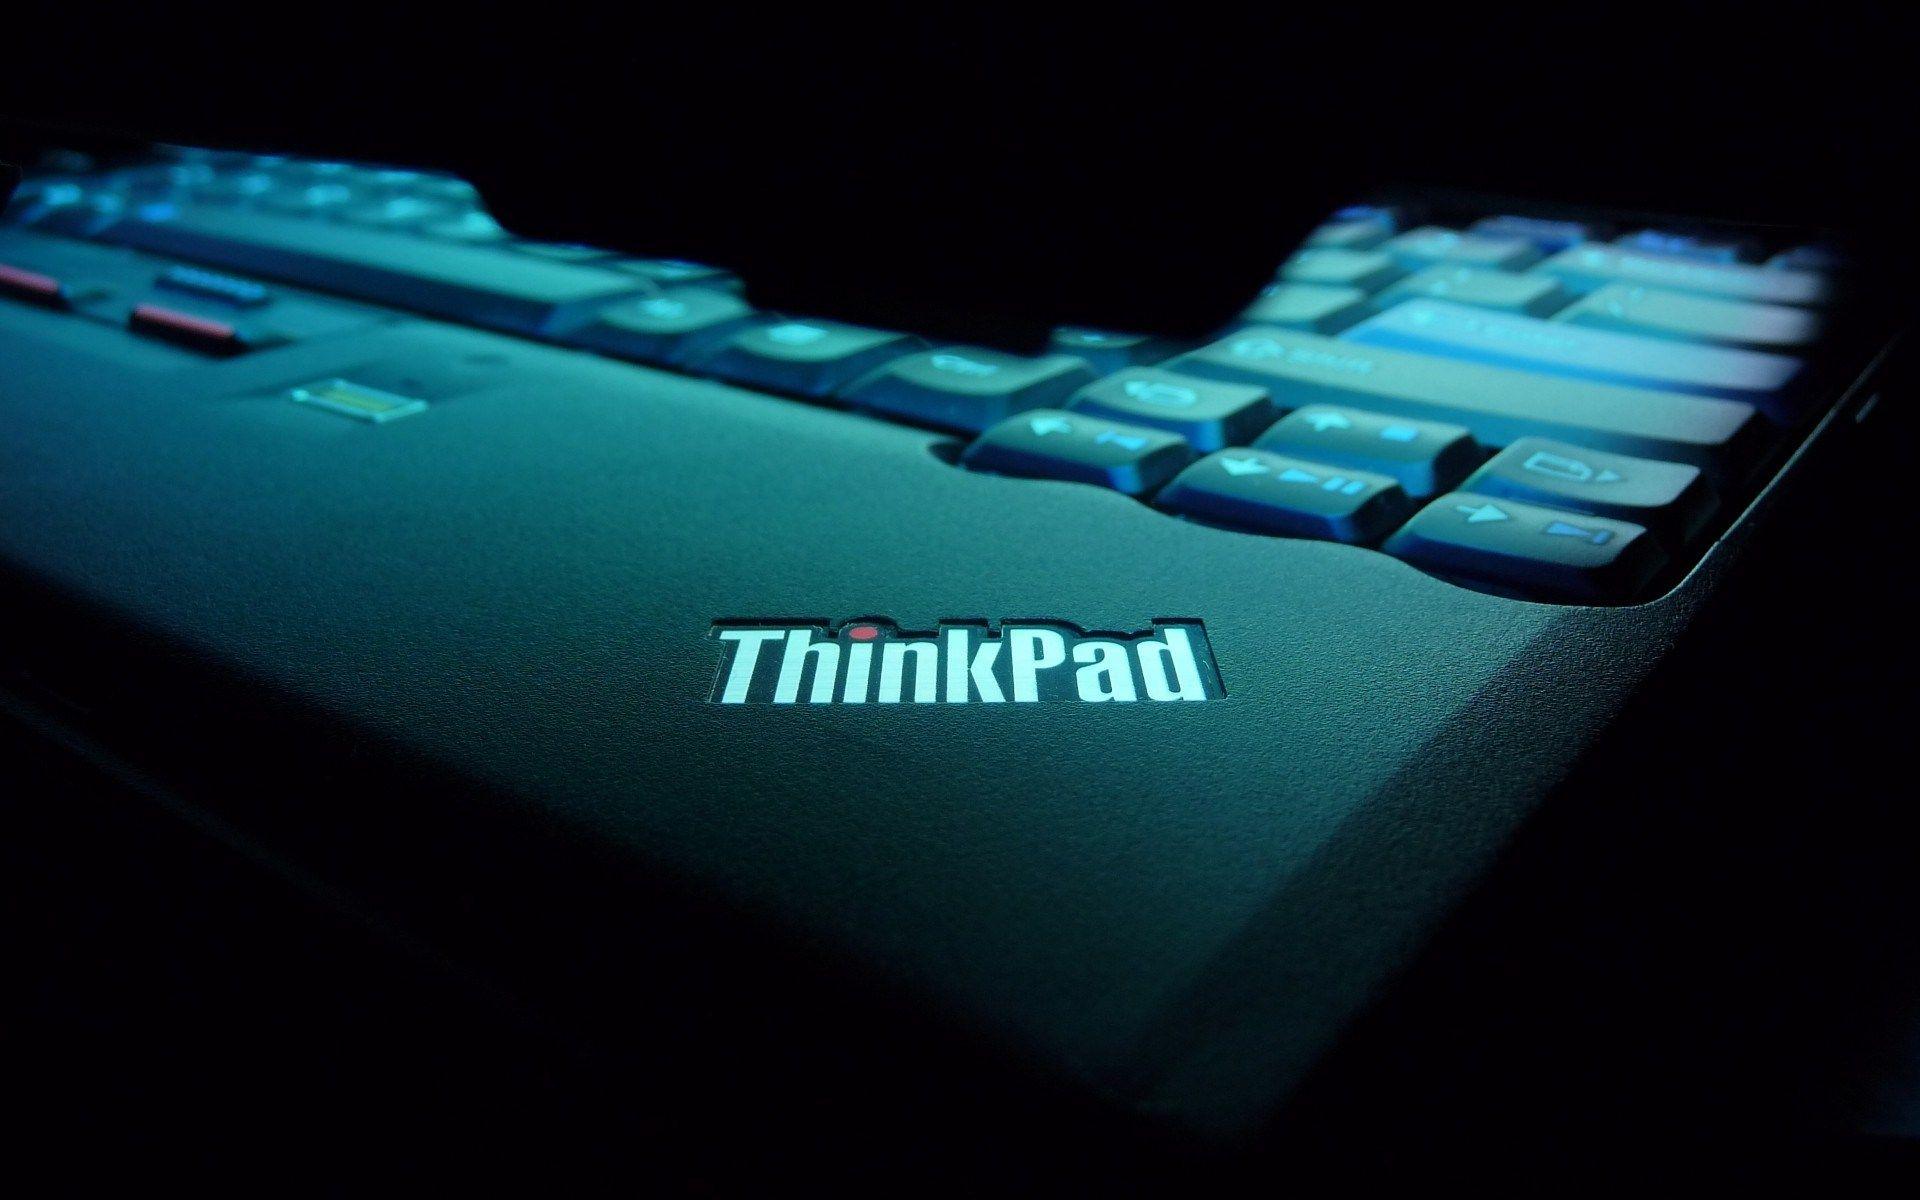 Lenovo Thinkpad Hd Backgrounds